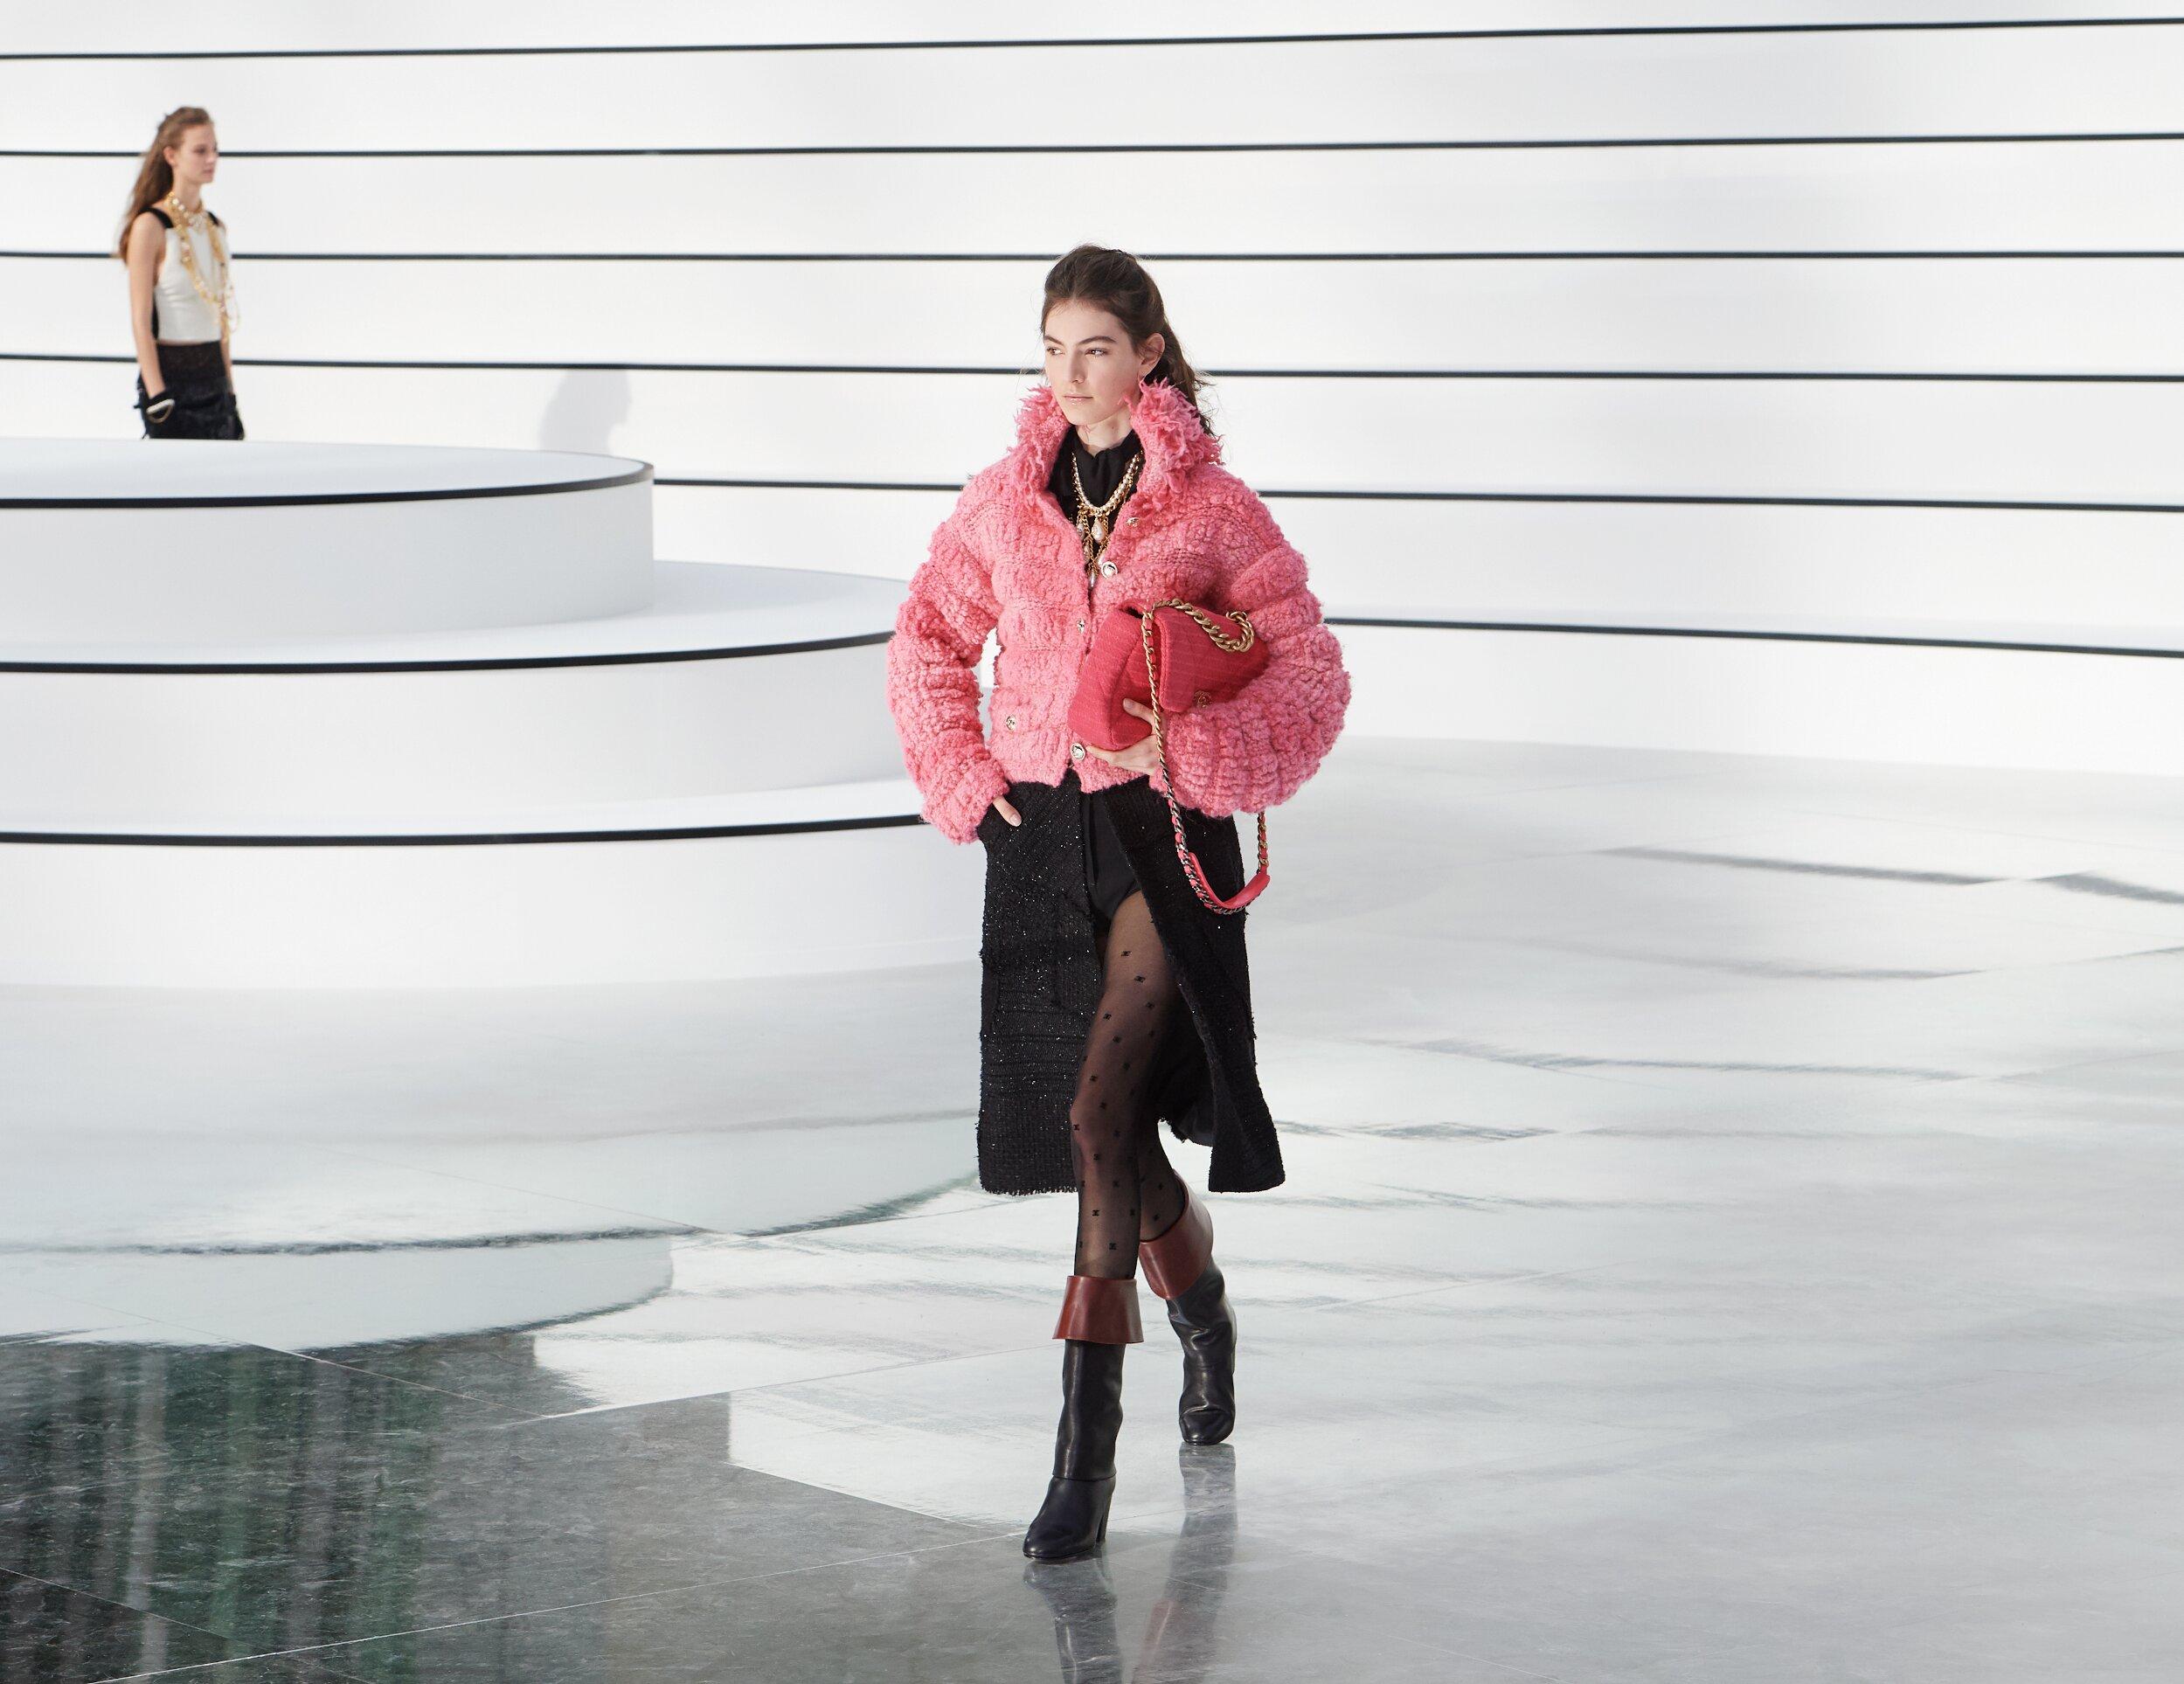 Chanel Winter 2020 Catwalk